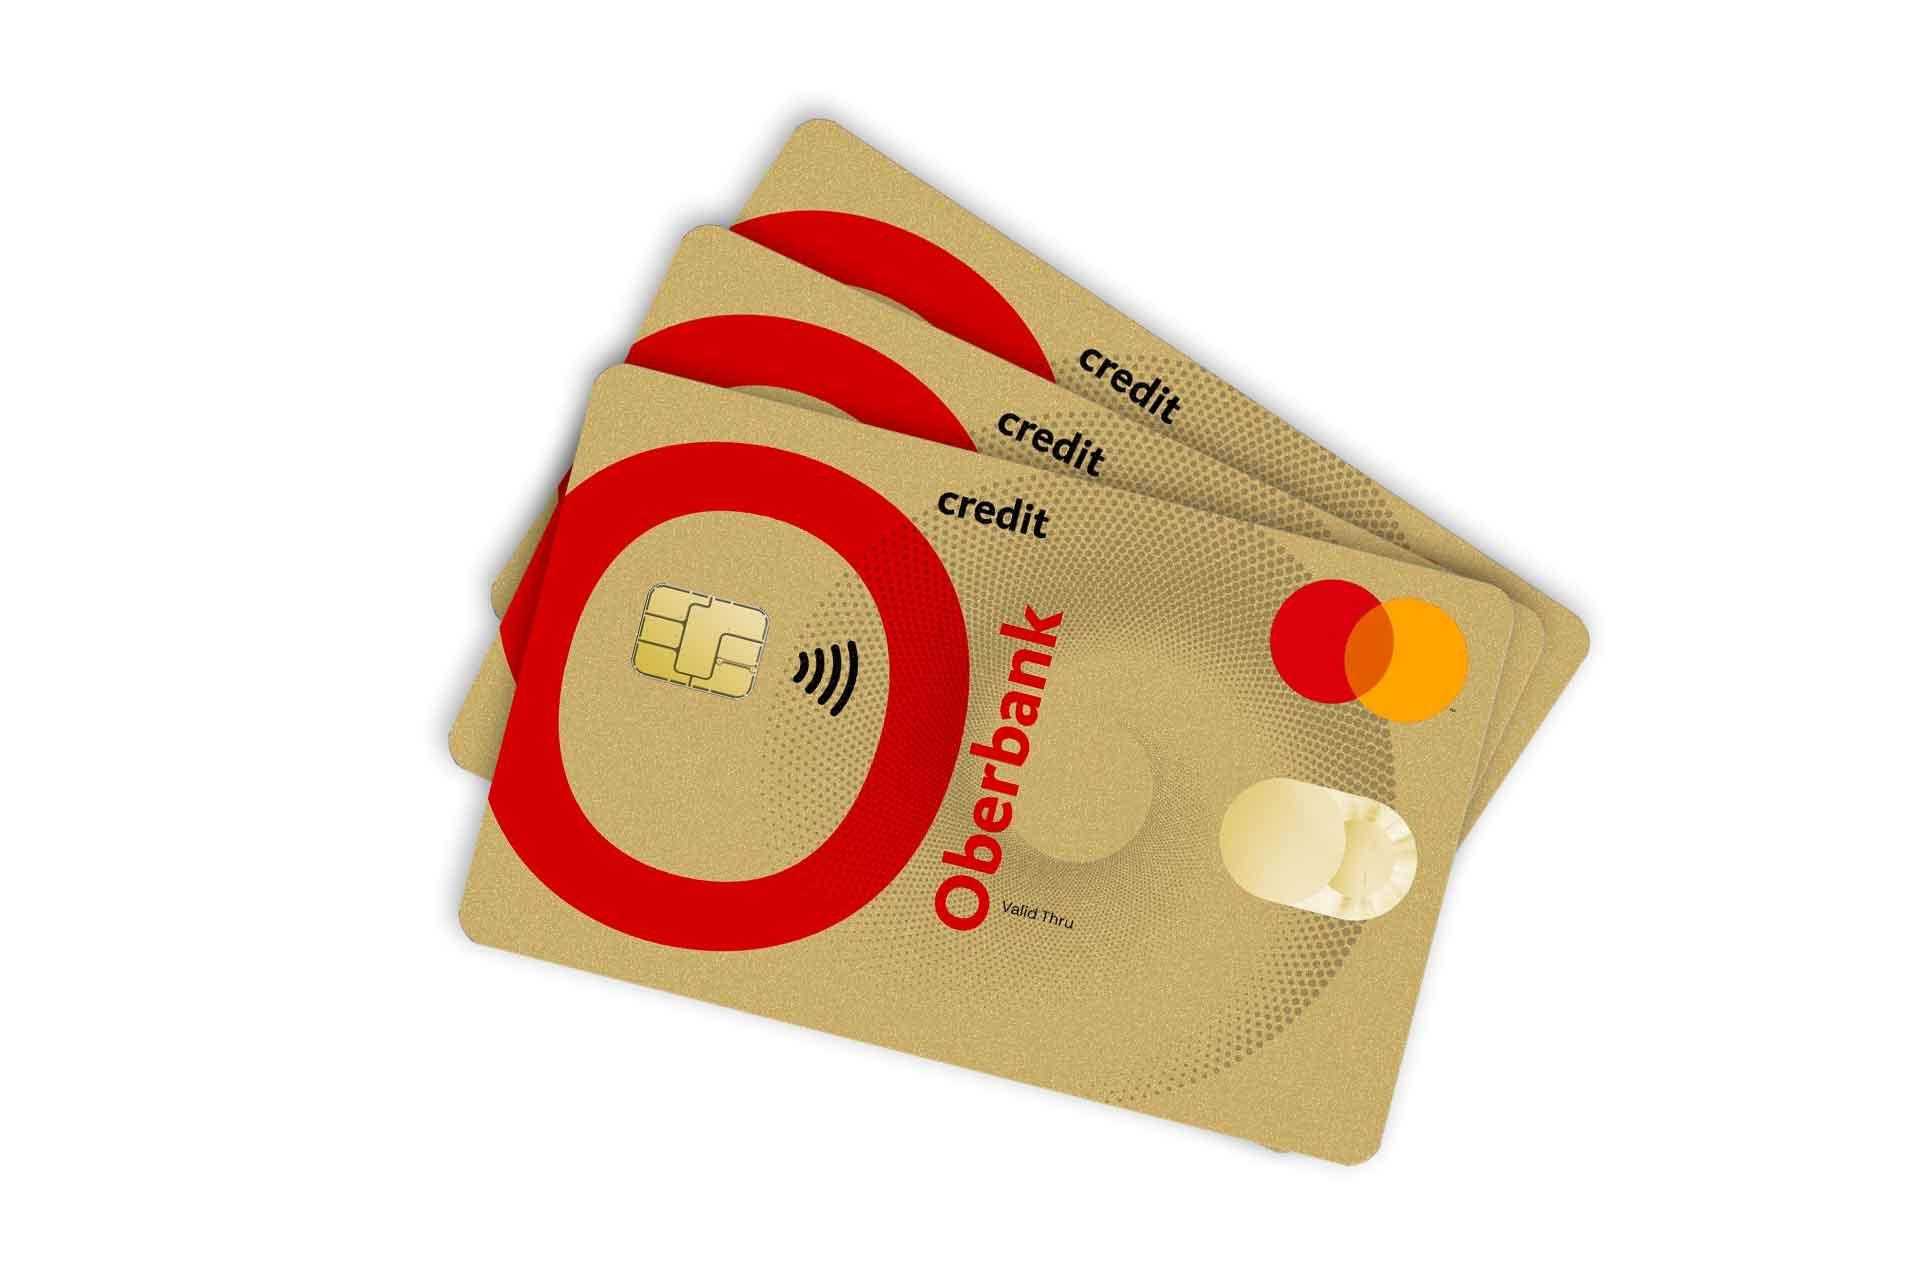 Oberbank E Banking